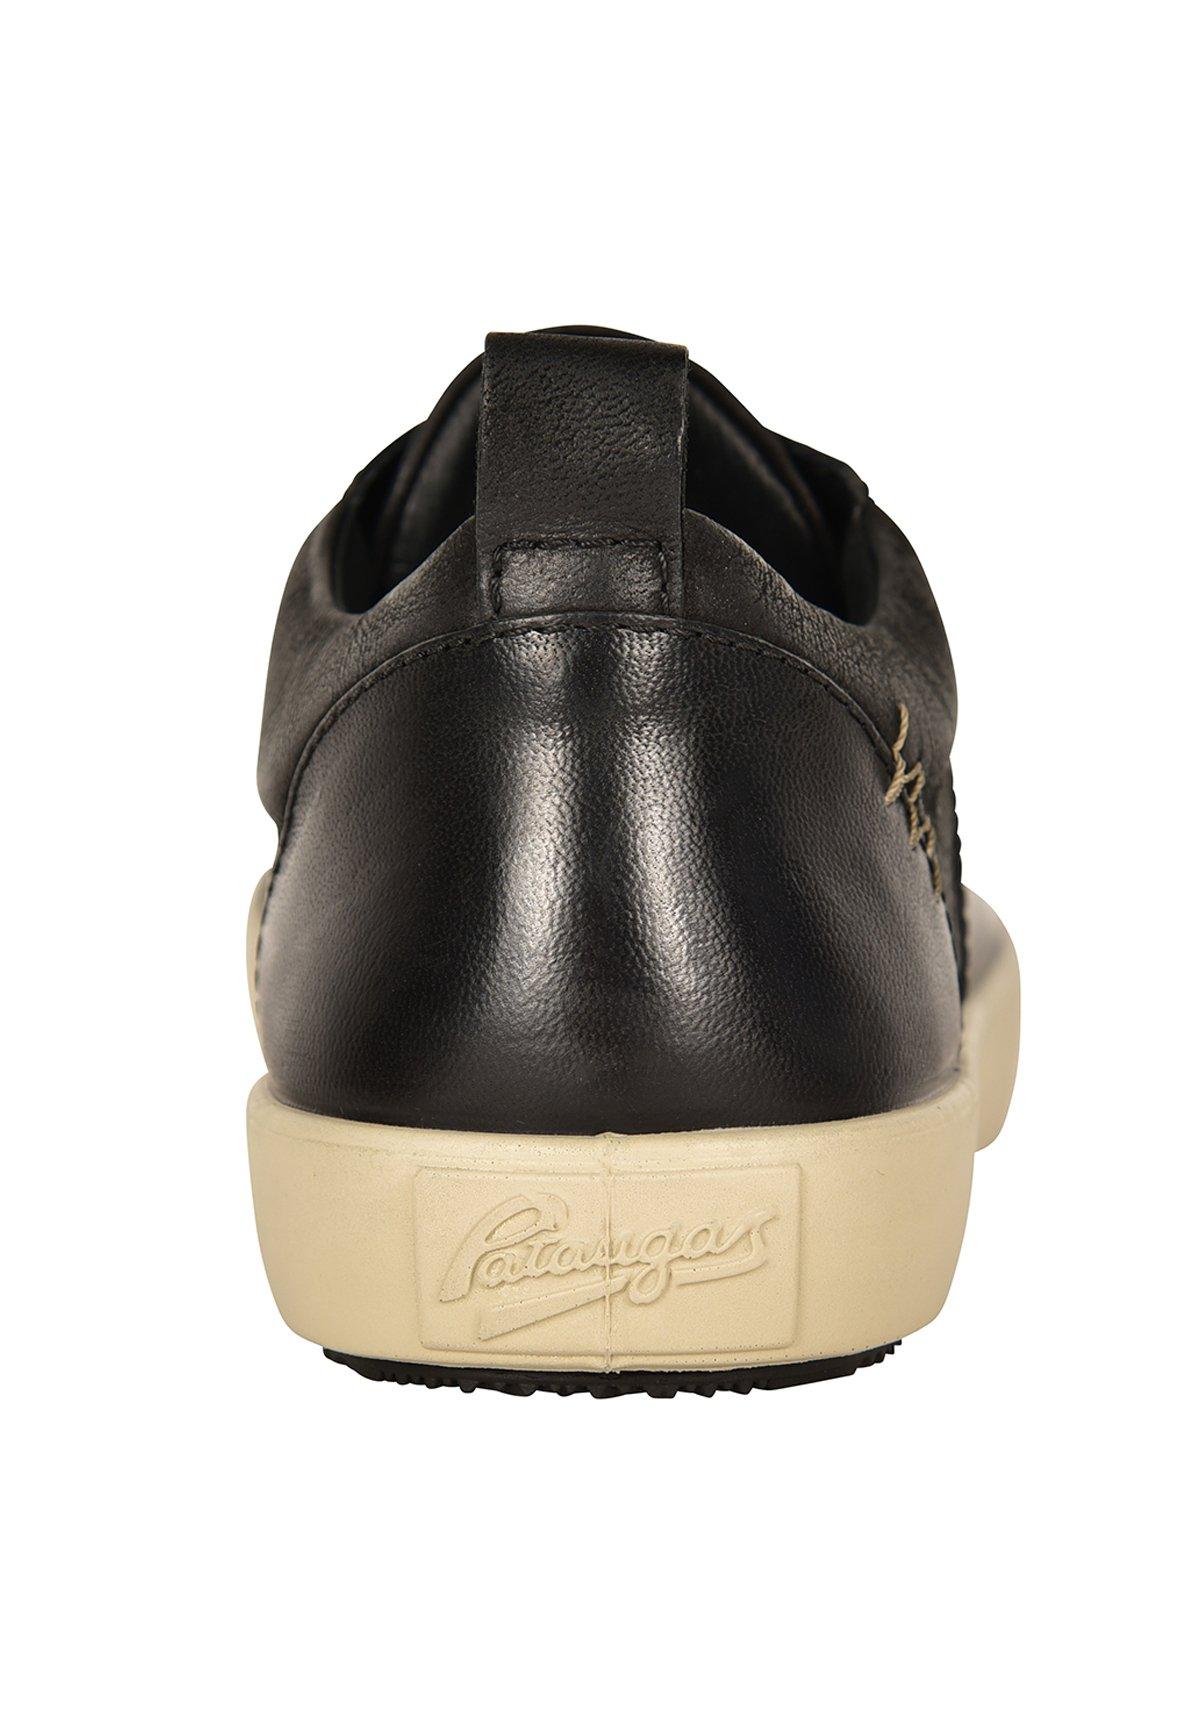 Pataugas Sneaker low - black/schwarz - Herrenschuhe gHVNw